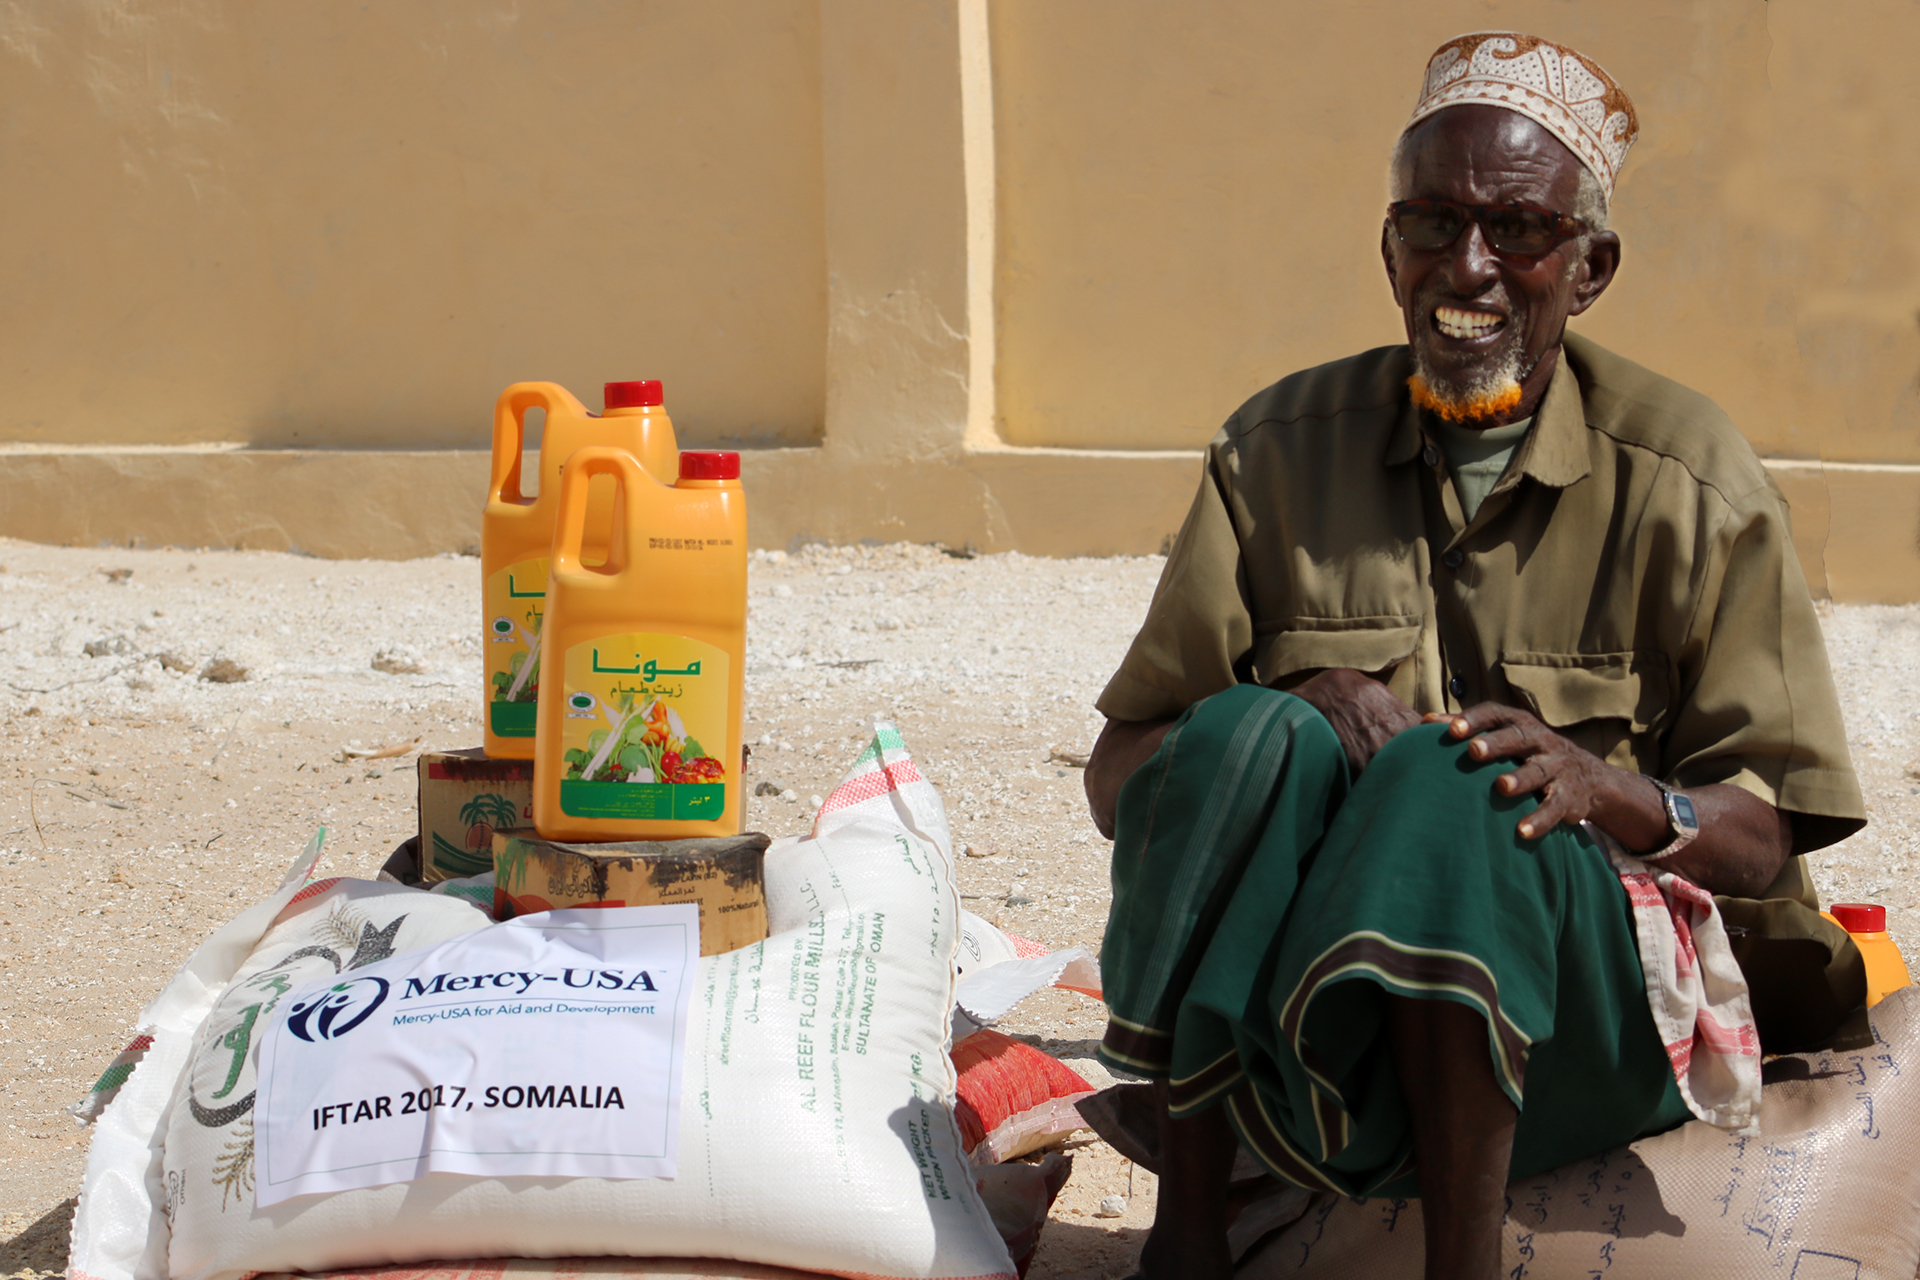 Somaliauncleiftar